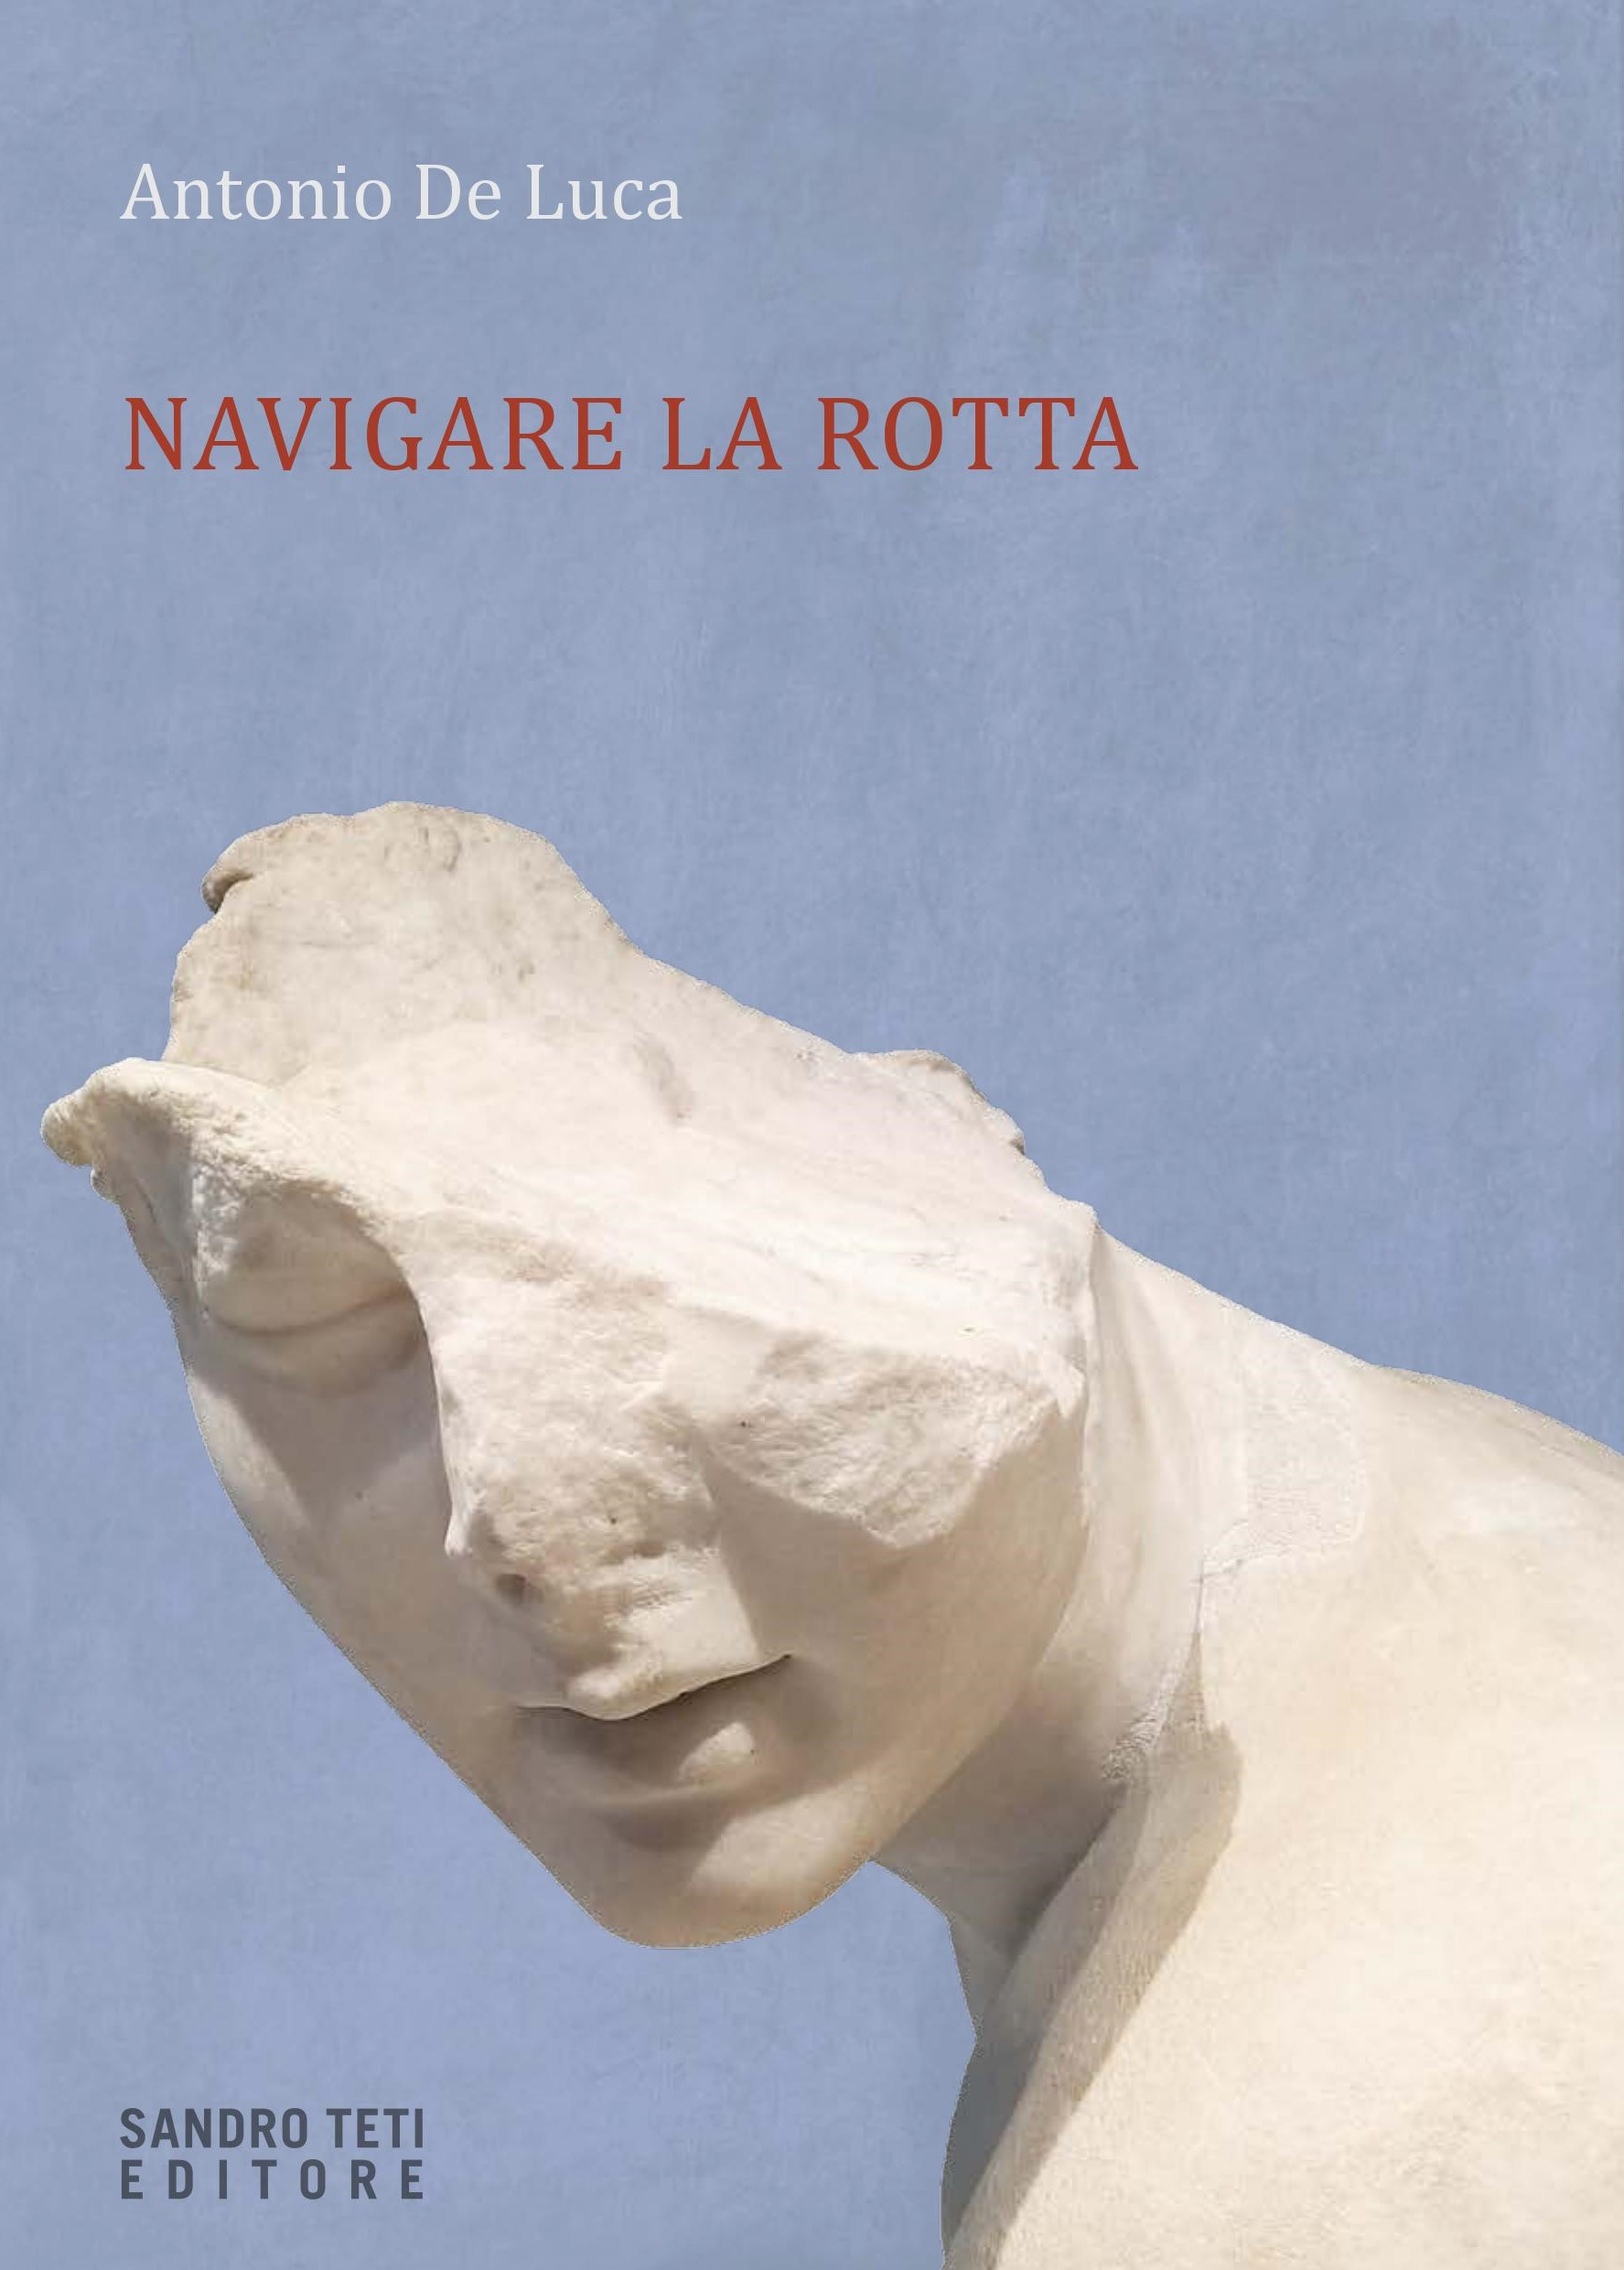 Antonio De LucaNavigare la rottanovità 2017